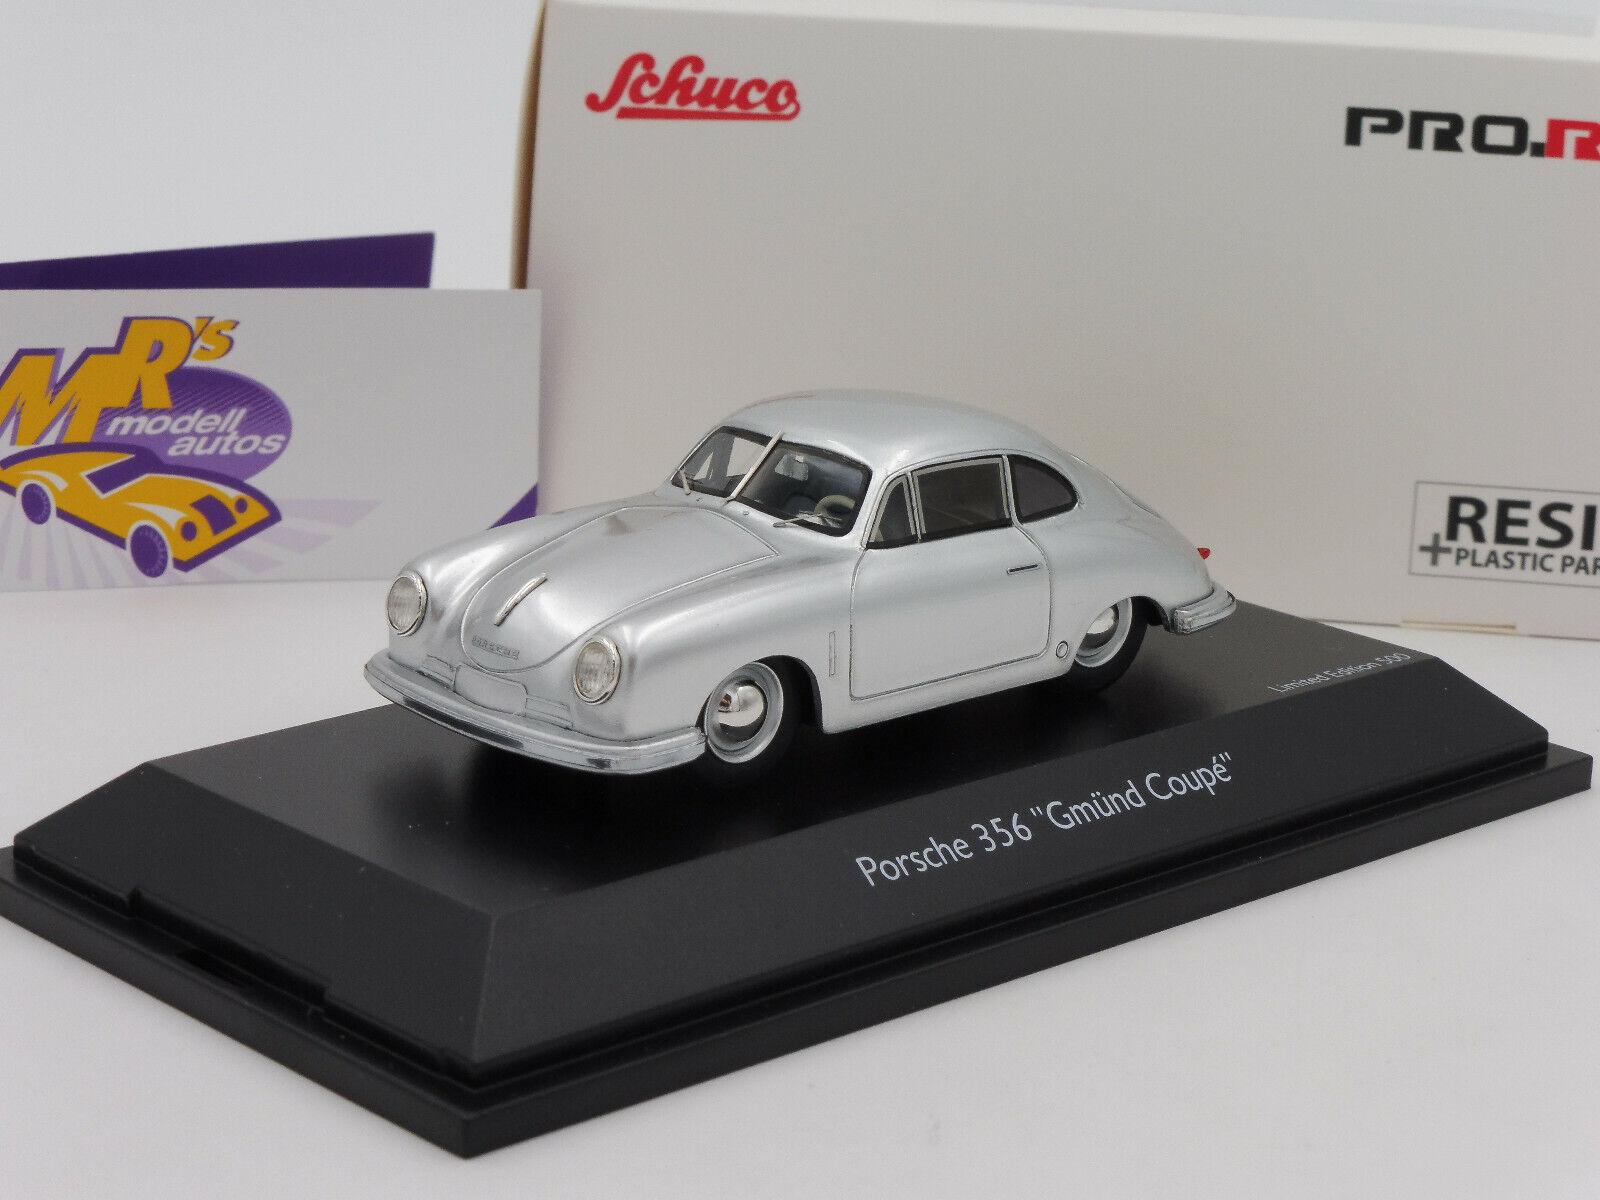 Schuco Pro.R 08798 Porsche 356   Gmünd Coupe   Bj. 1948 silvermetallic 1 43